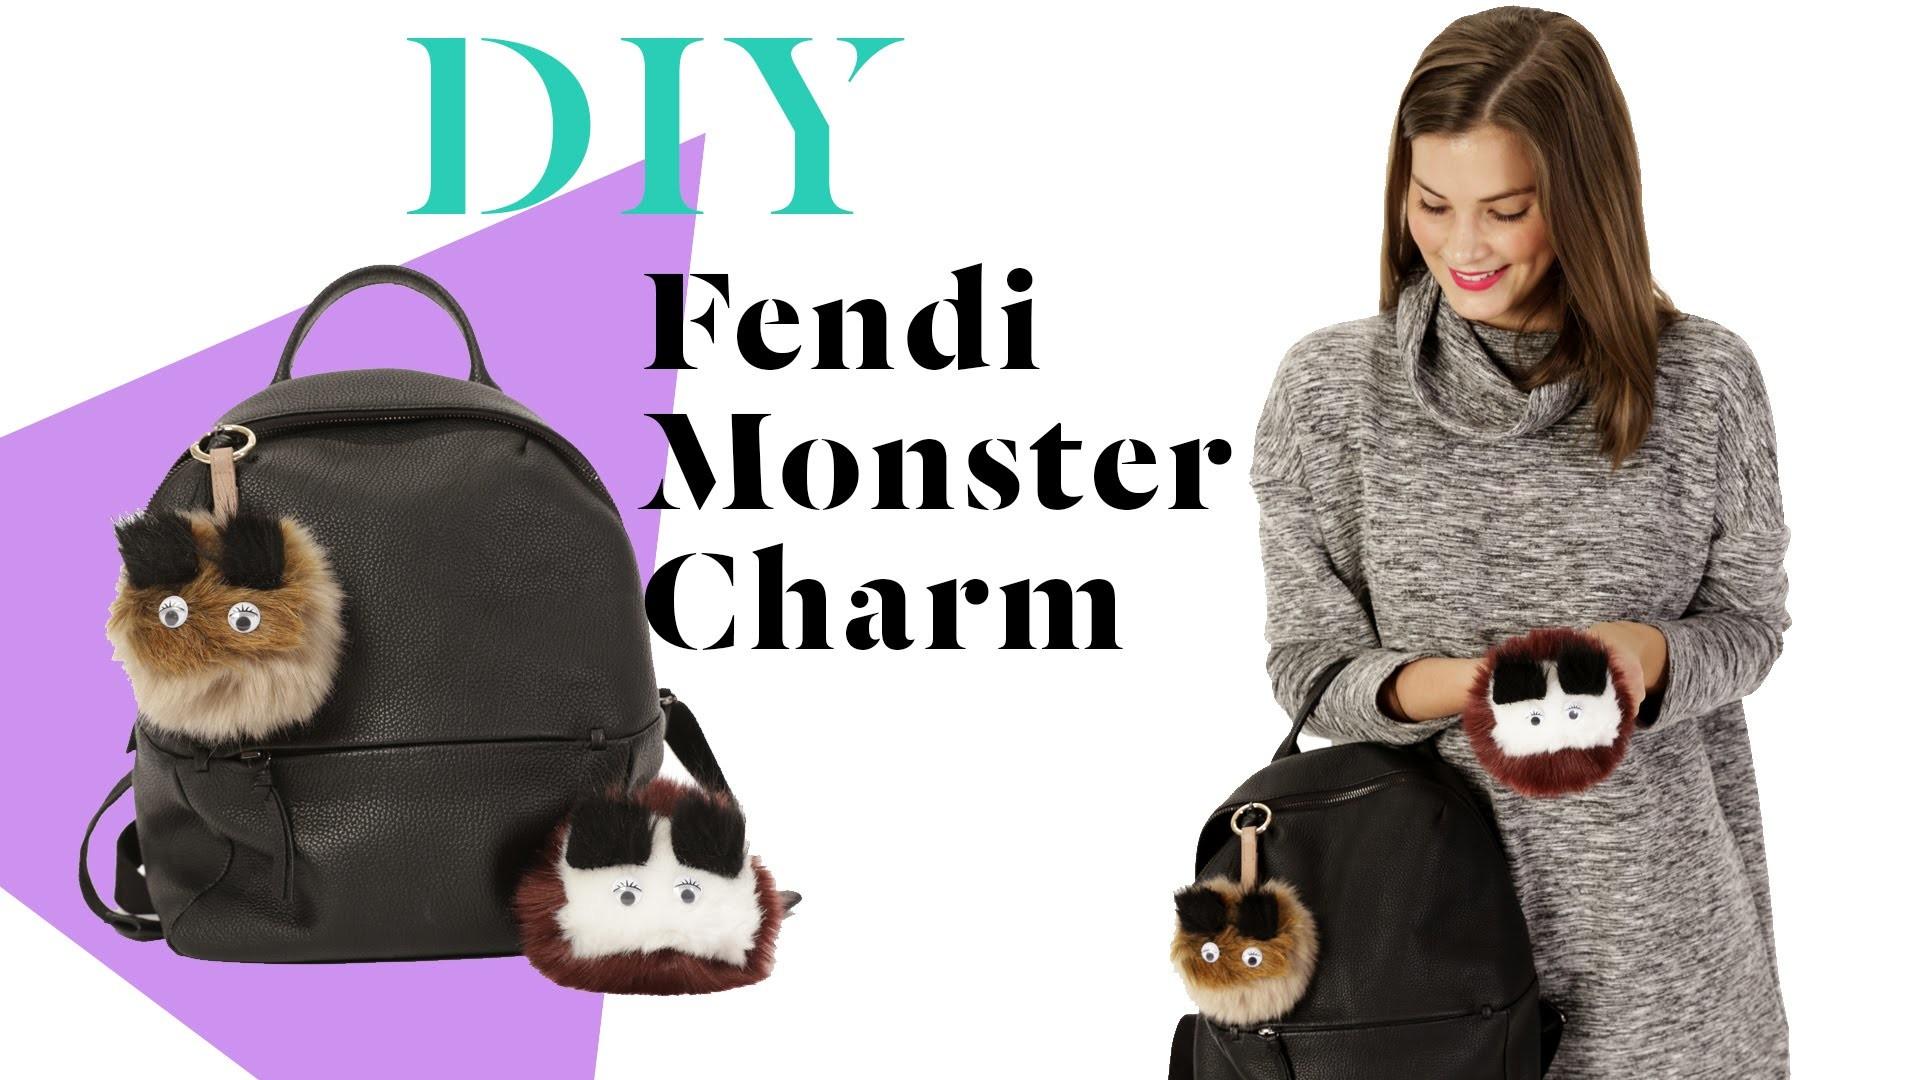 DIY Fendi Bag Bugs » Ganz easy selber basteln und 650 € sparen » Lifestyle Hacks| Stylight